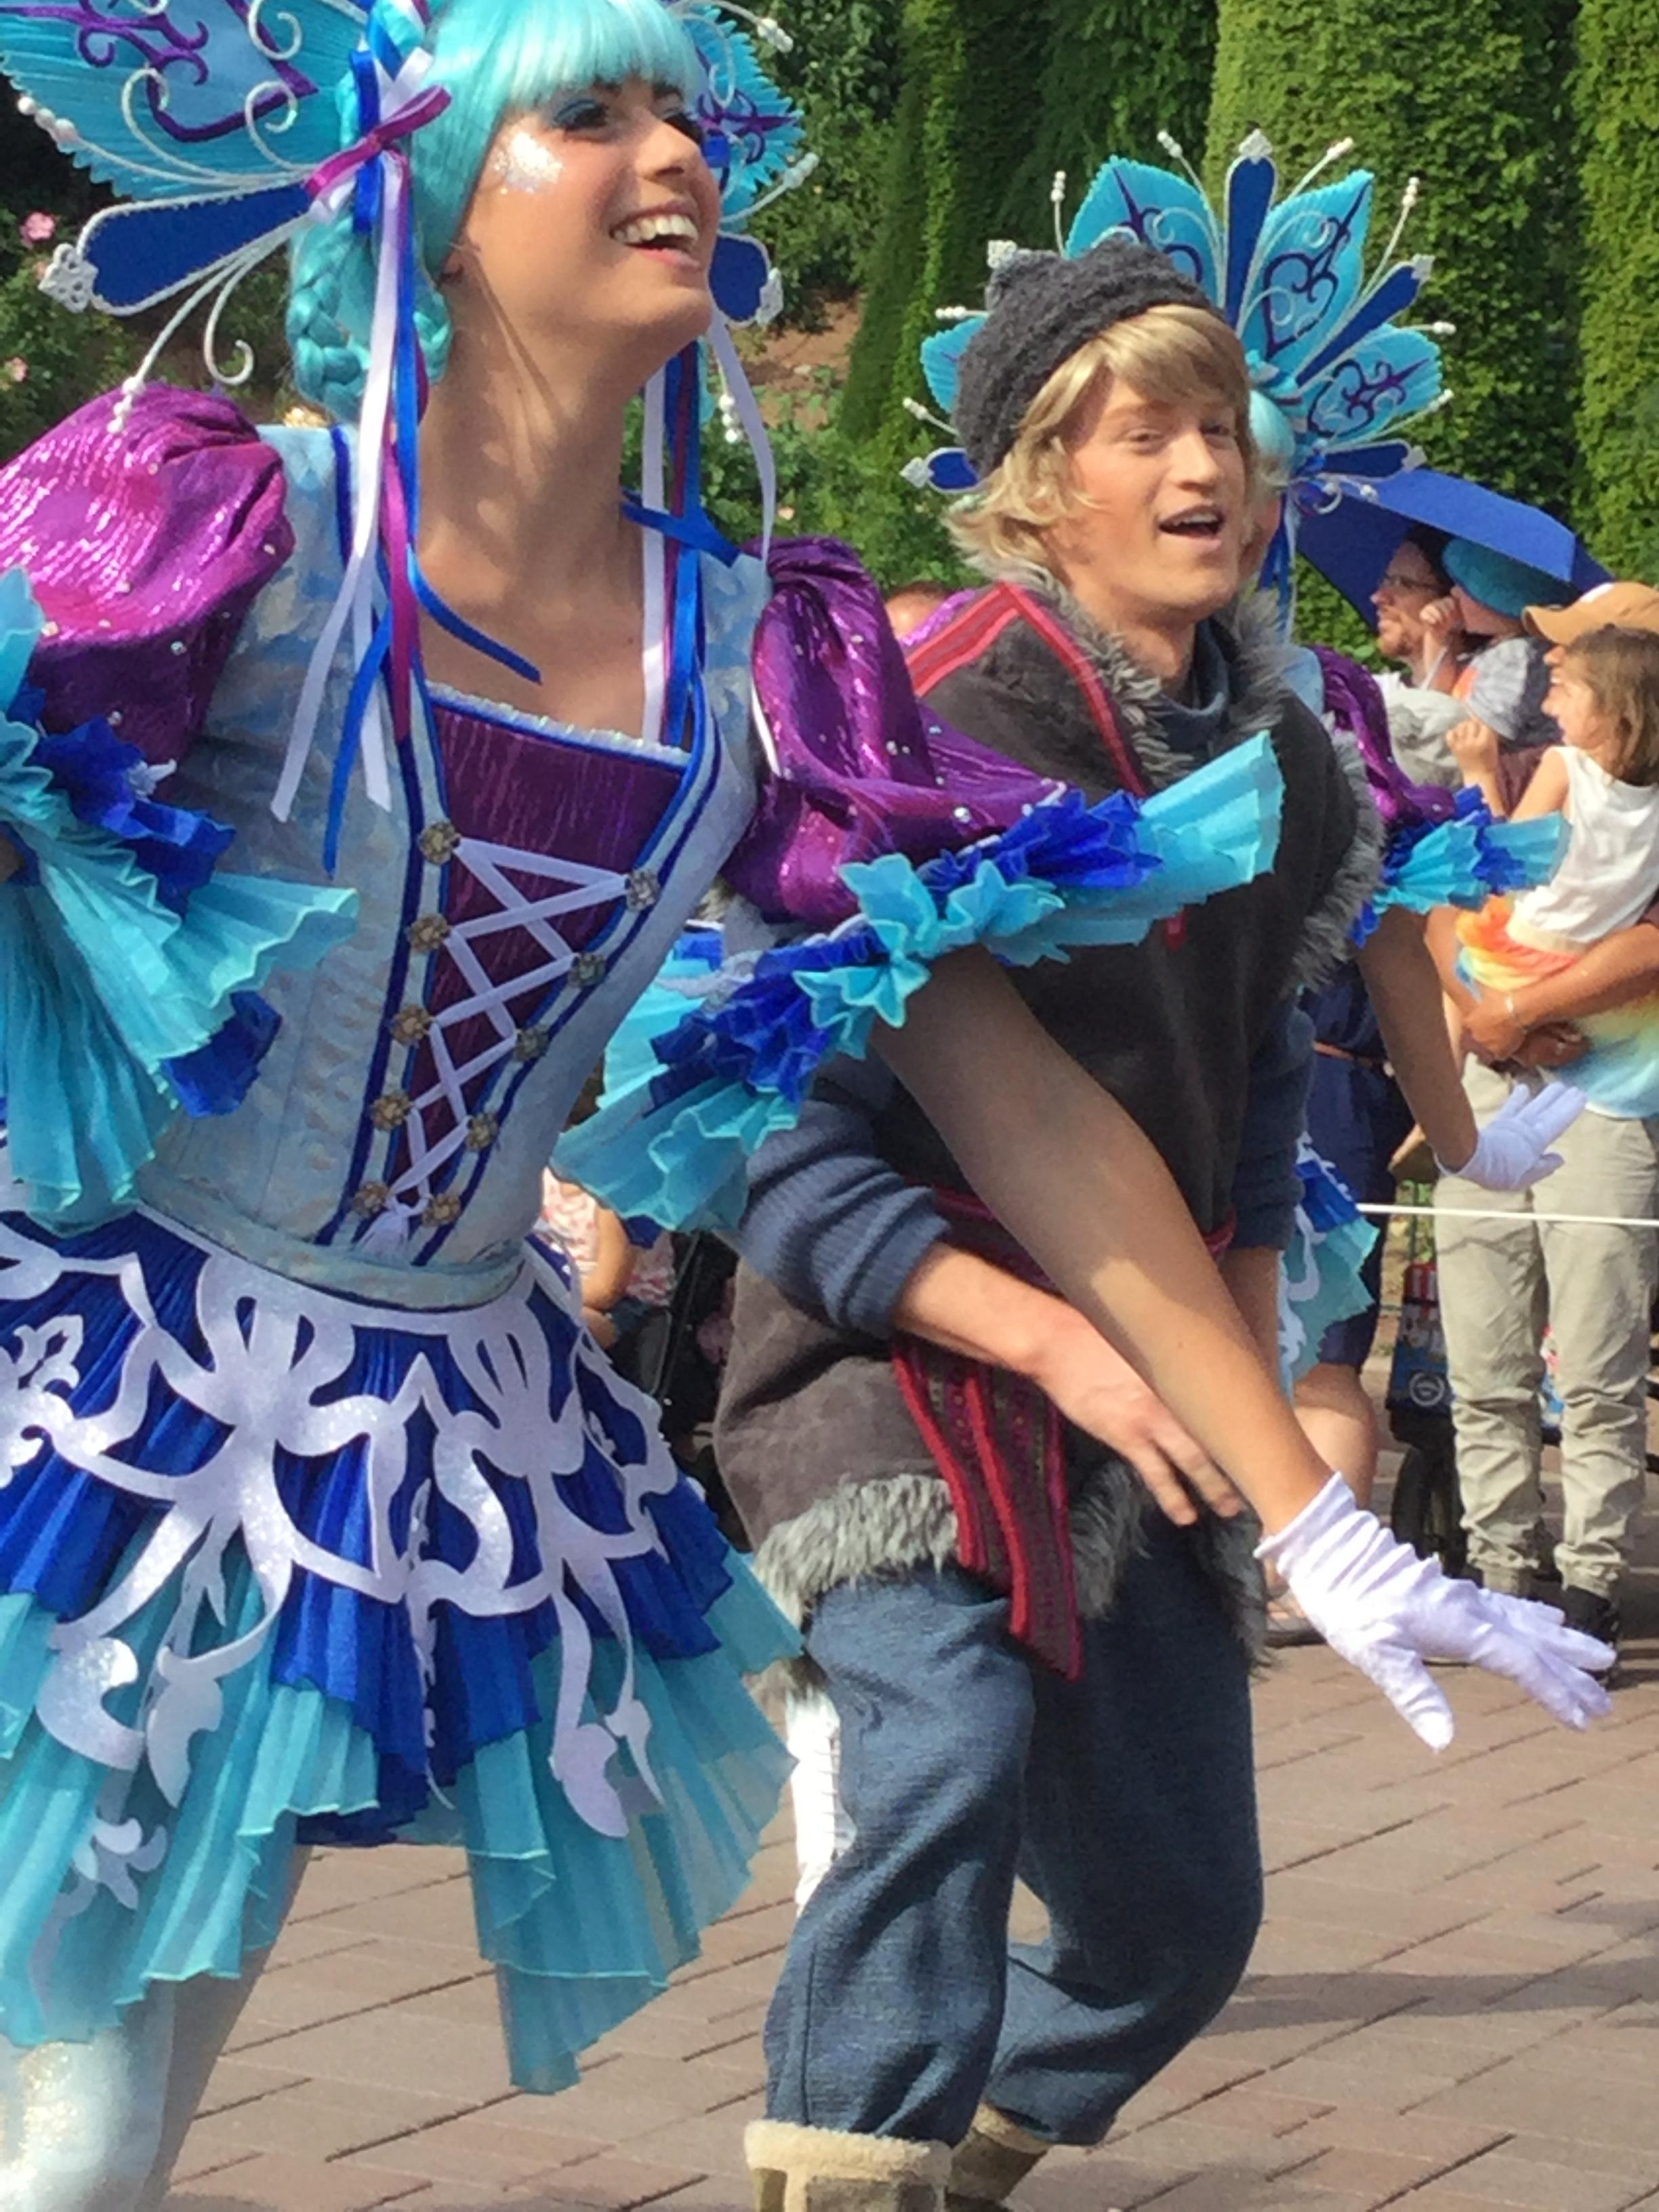 Wonder Kids Disneyland Paris 2017 review